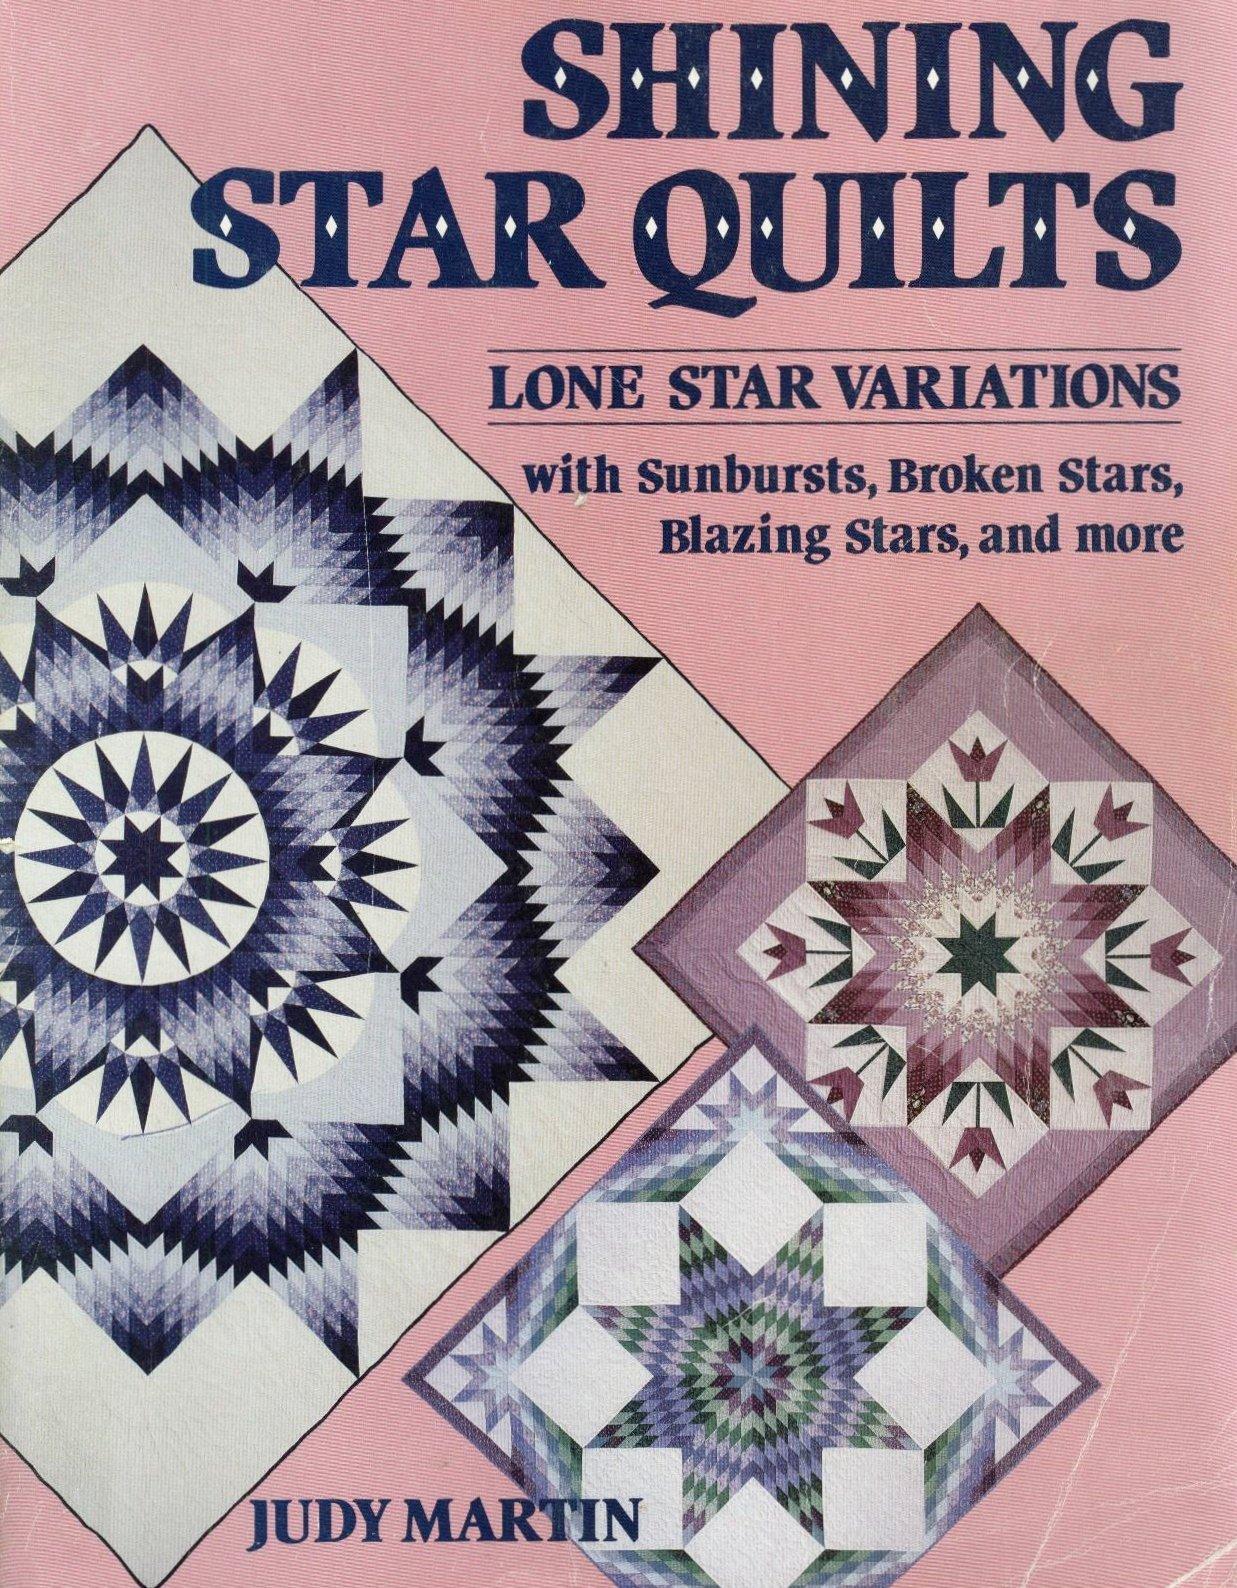 Shining Star Quilts Lone Star Variations With Sunbursts Broken